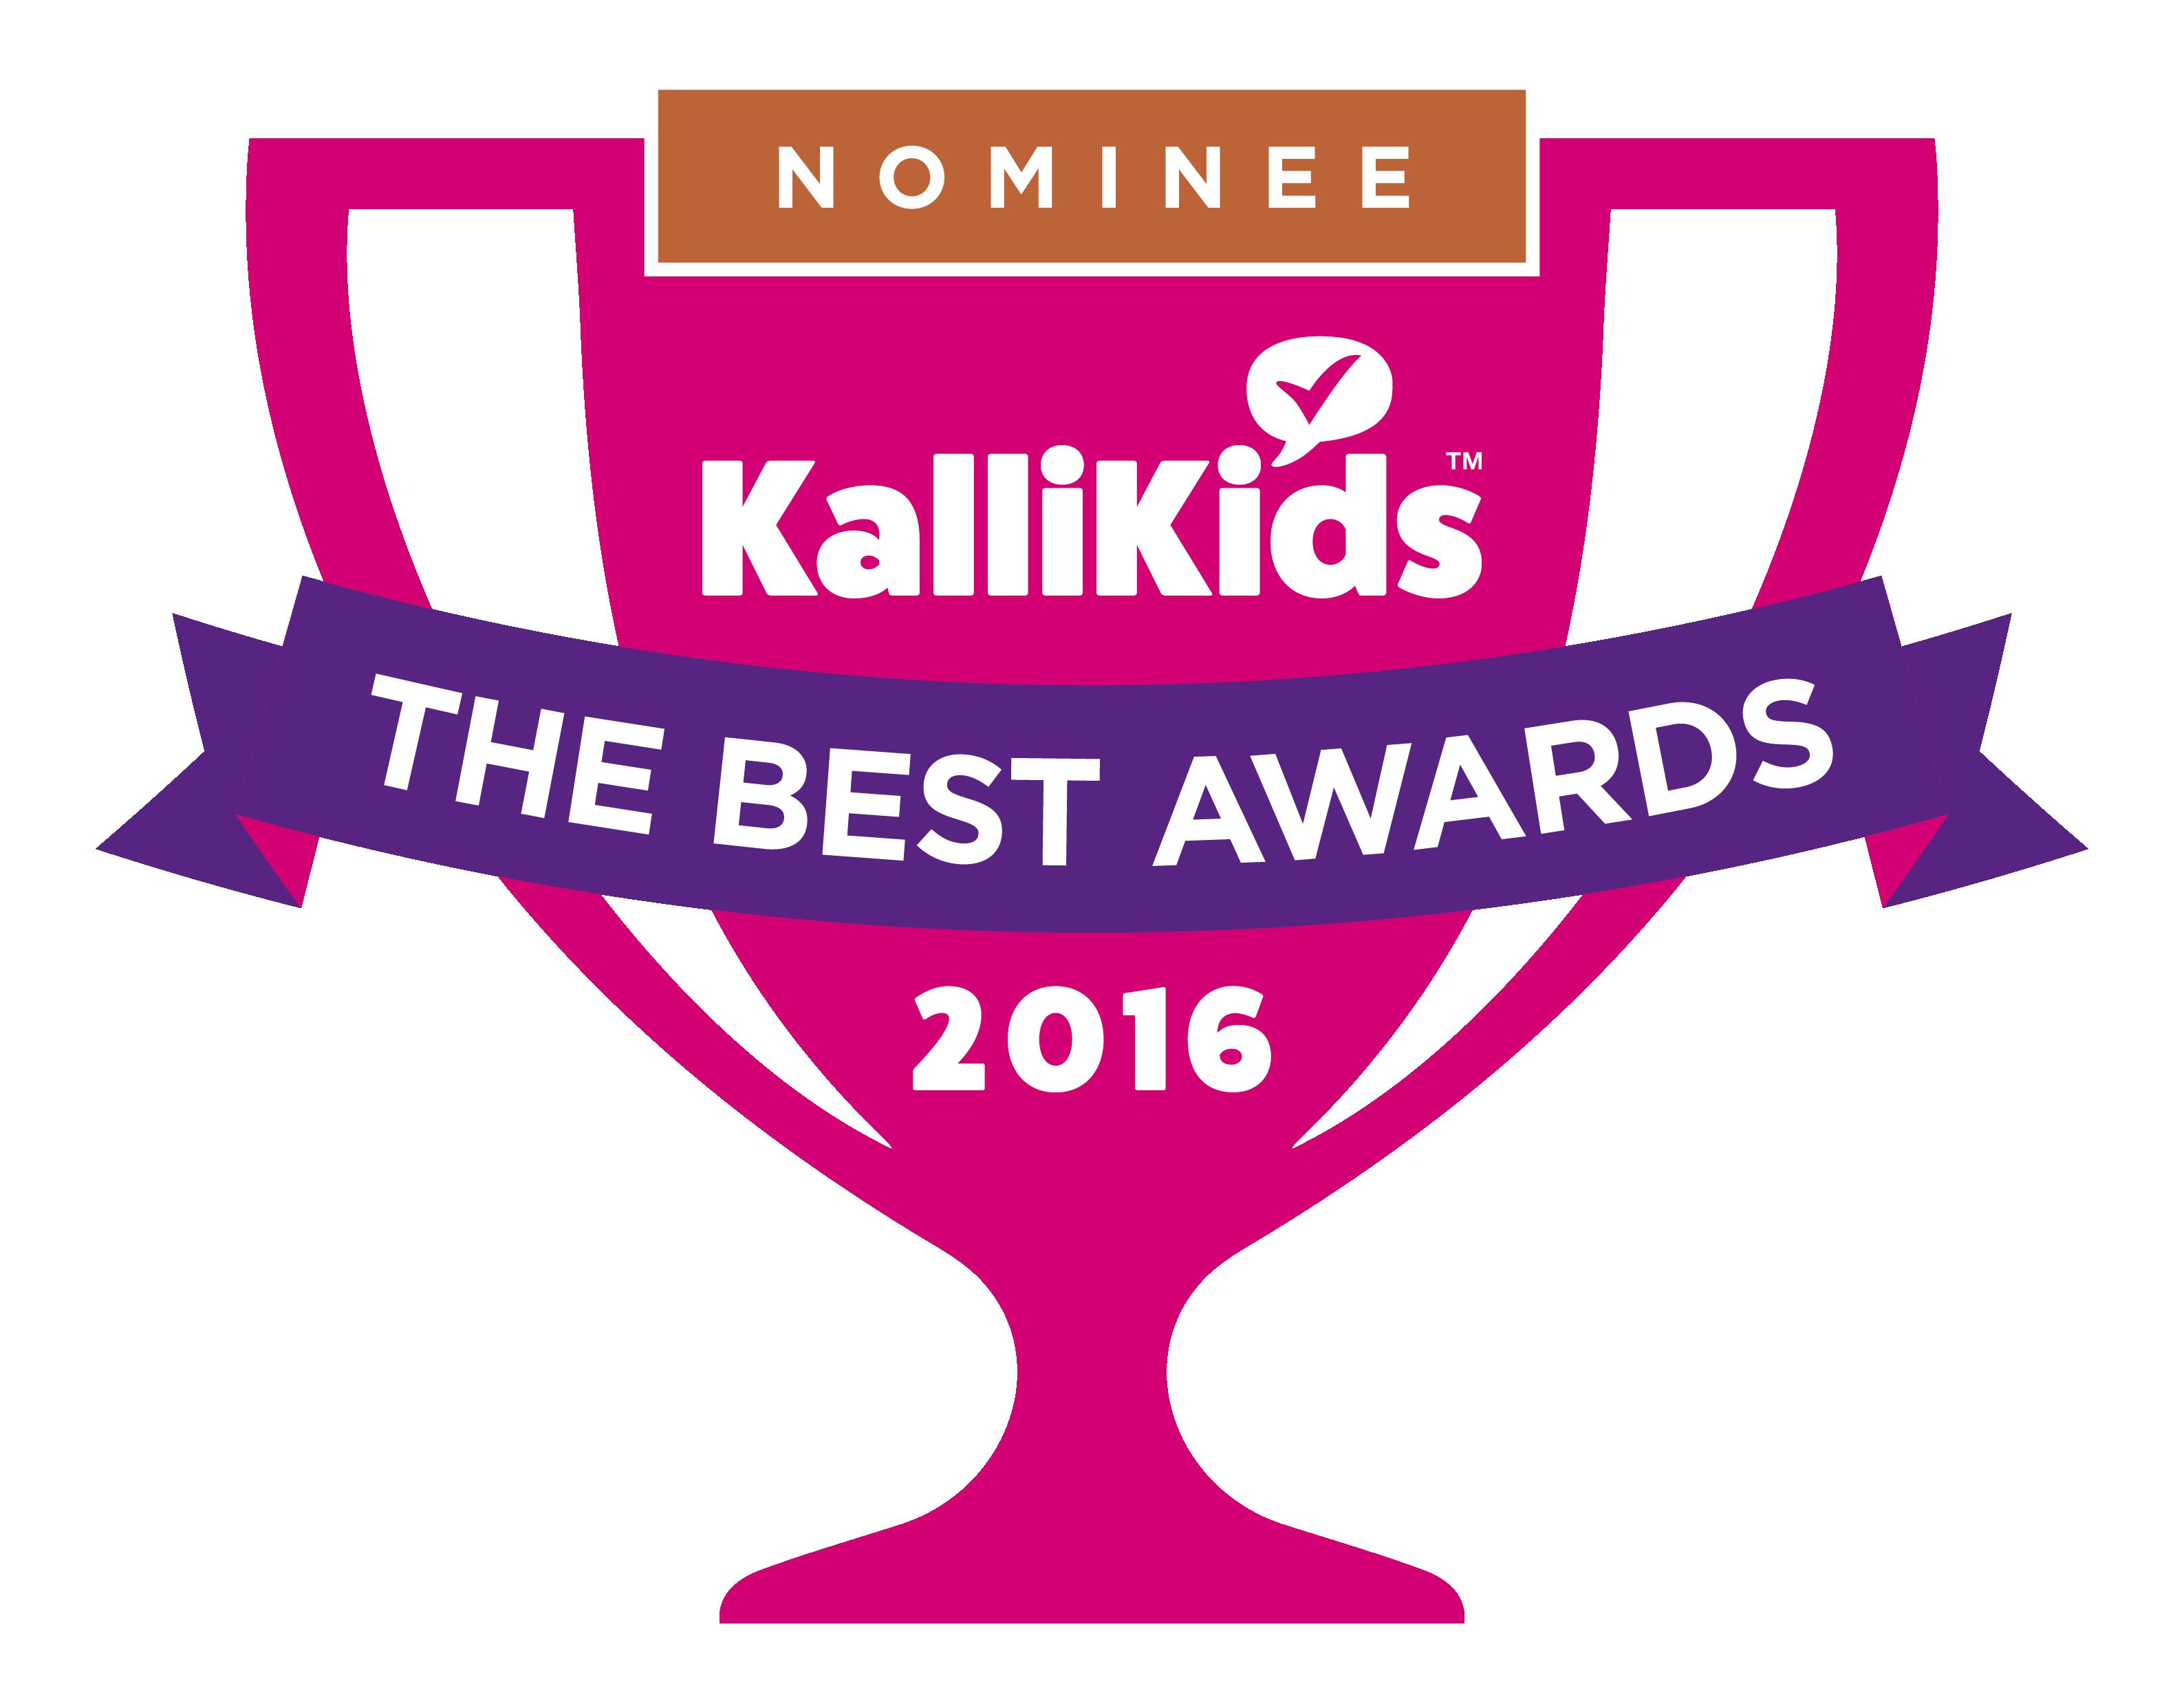 KalliKids Awards Nominee